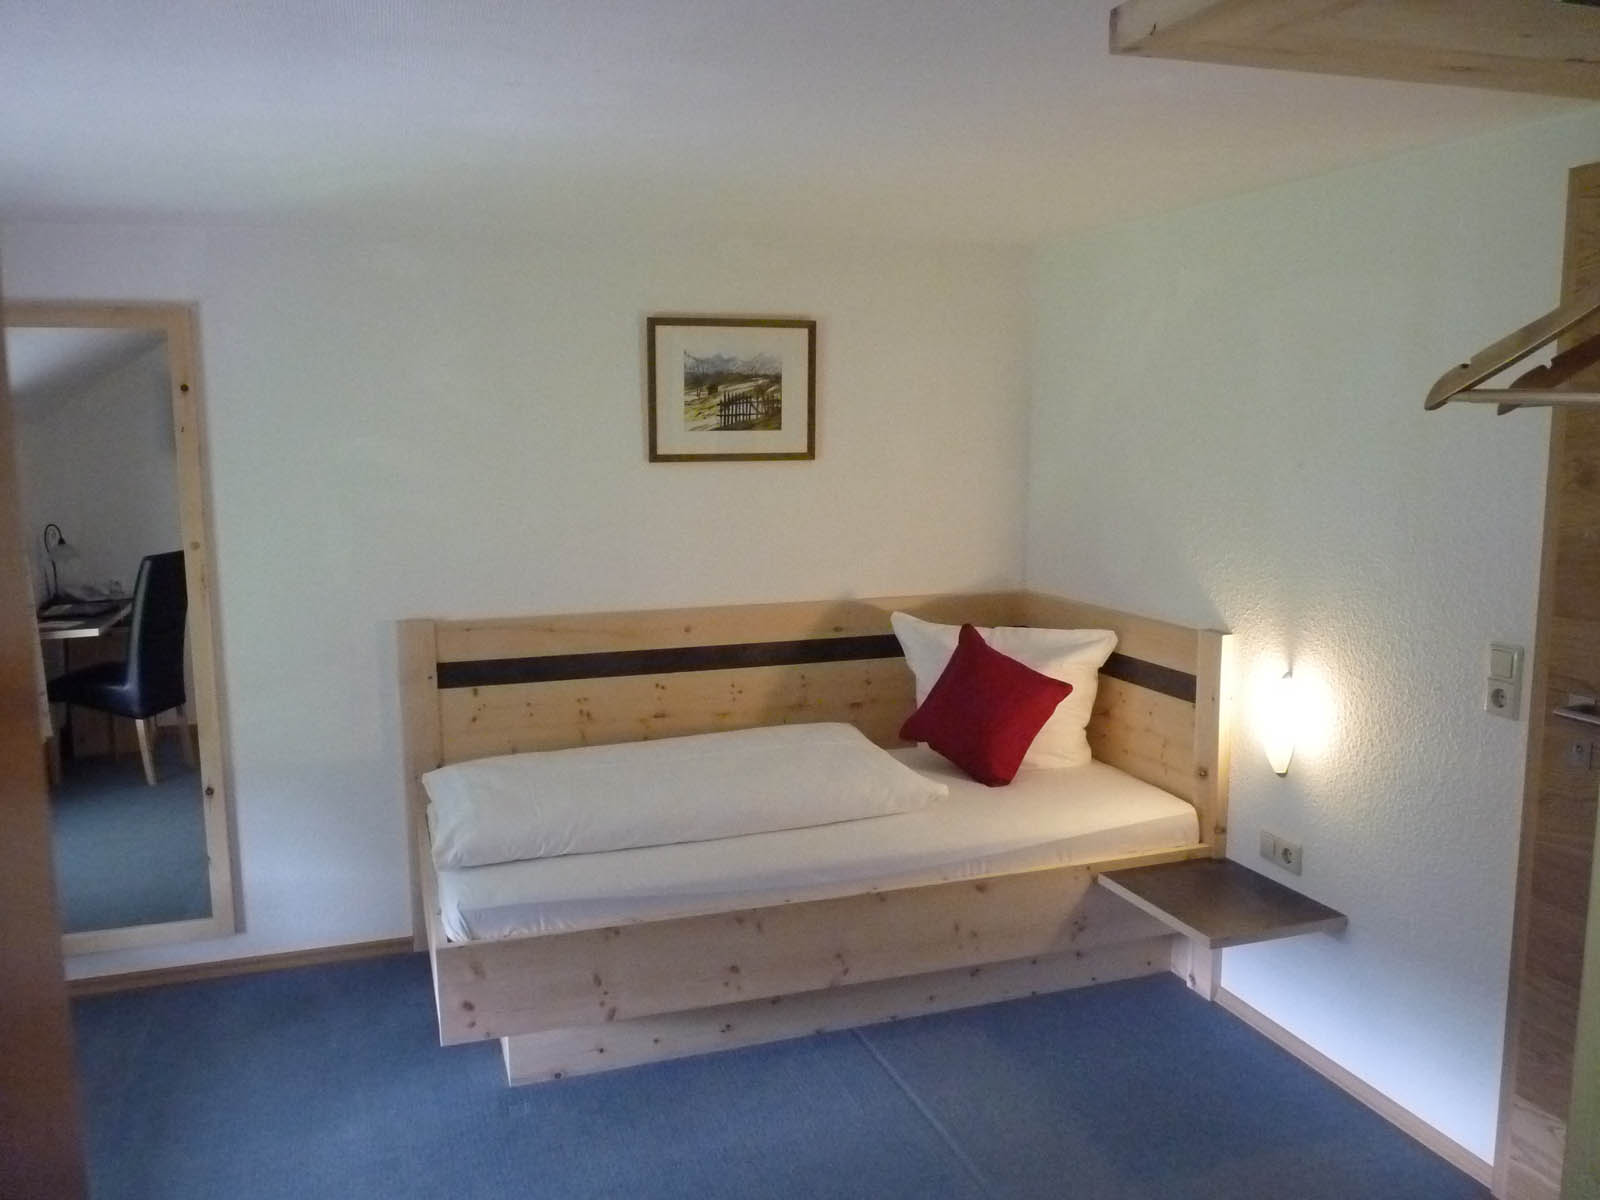 Spend the night in the Allgäu - Wellness Hotel Sontheim